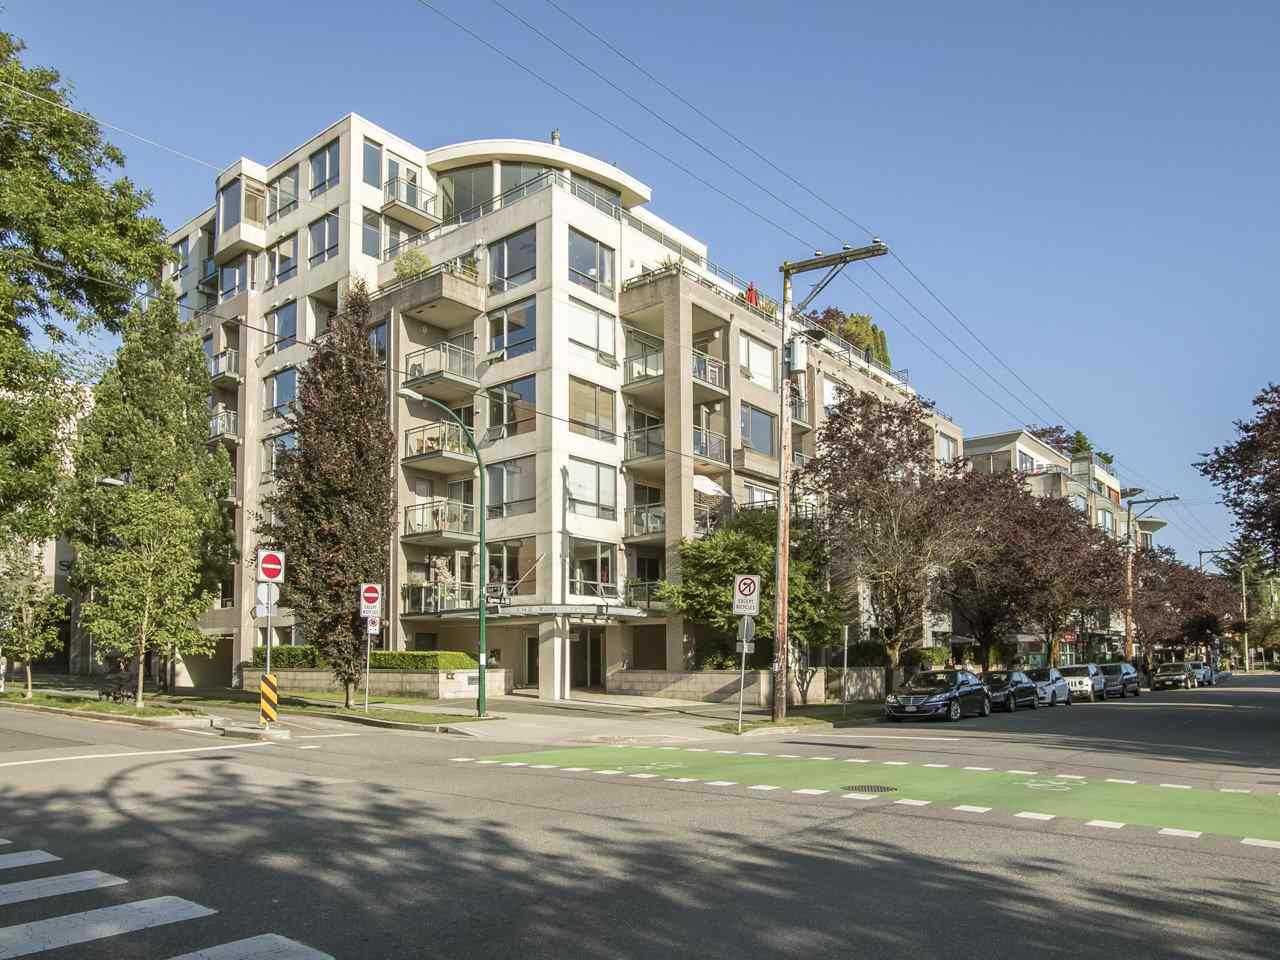 Main Photo: 203 1888 YORK AVENUE in Vancouver: Kitsilano Condo for sale (Vancouver West)  : MLS®# R2183620